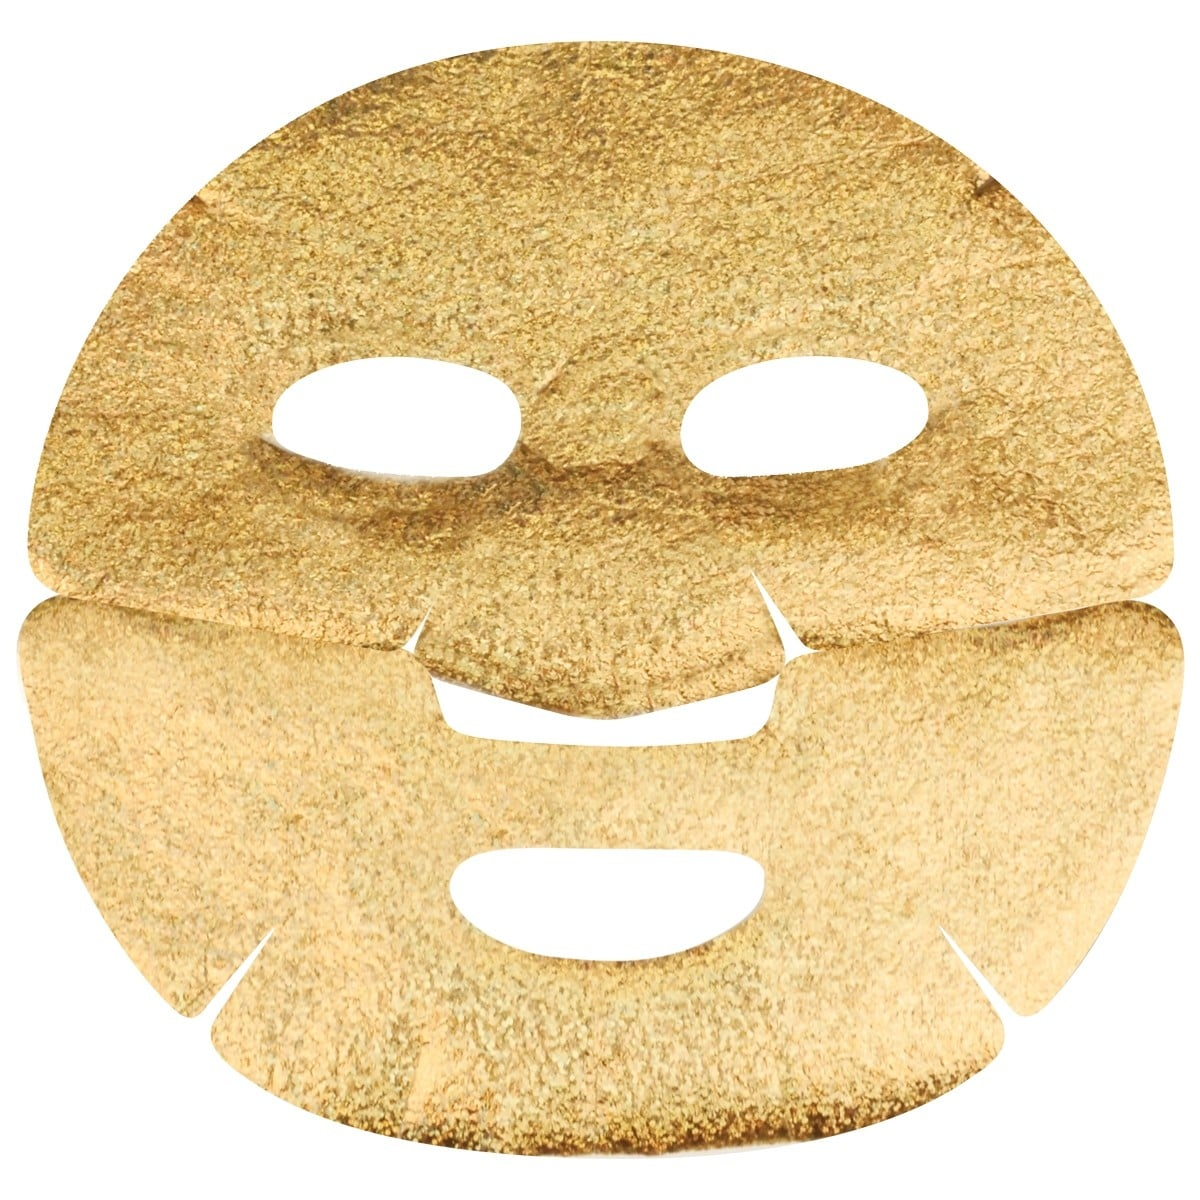 PÜR™ Sweet 16 MASK-querade Gold Confetti Hydrating Sheet Mask Set